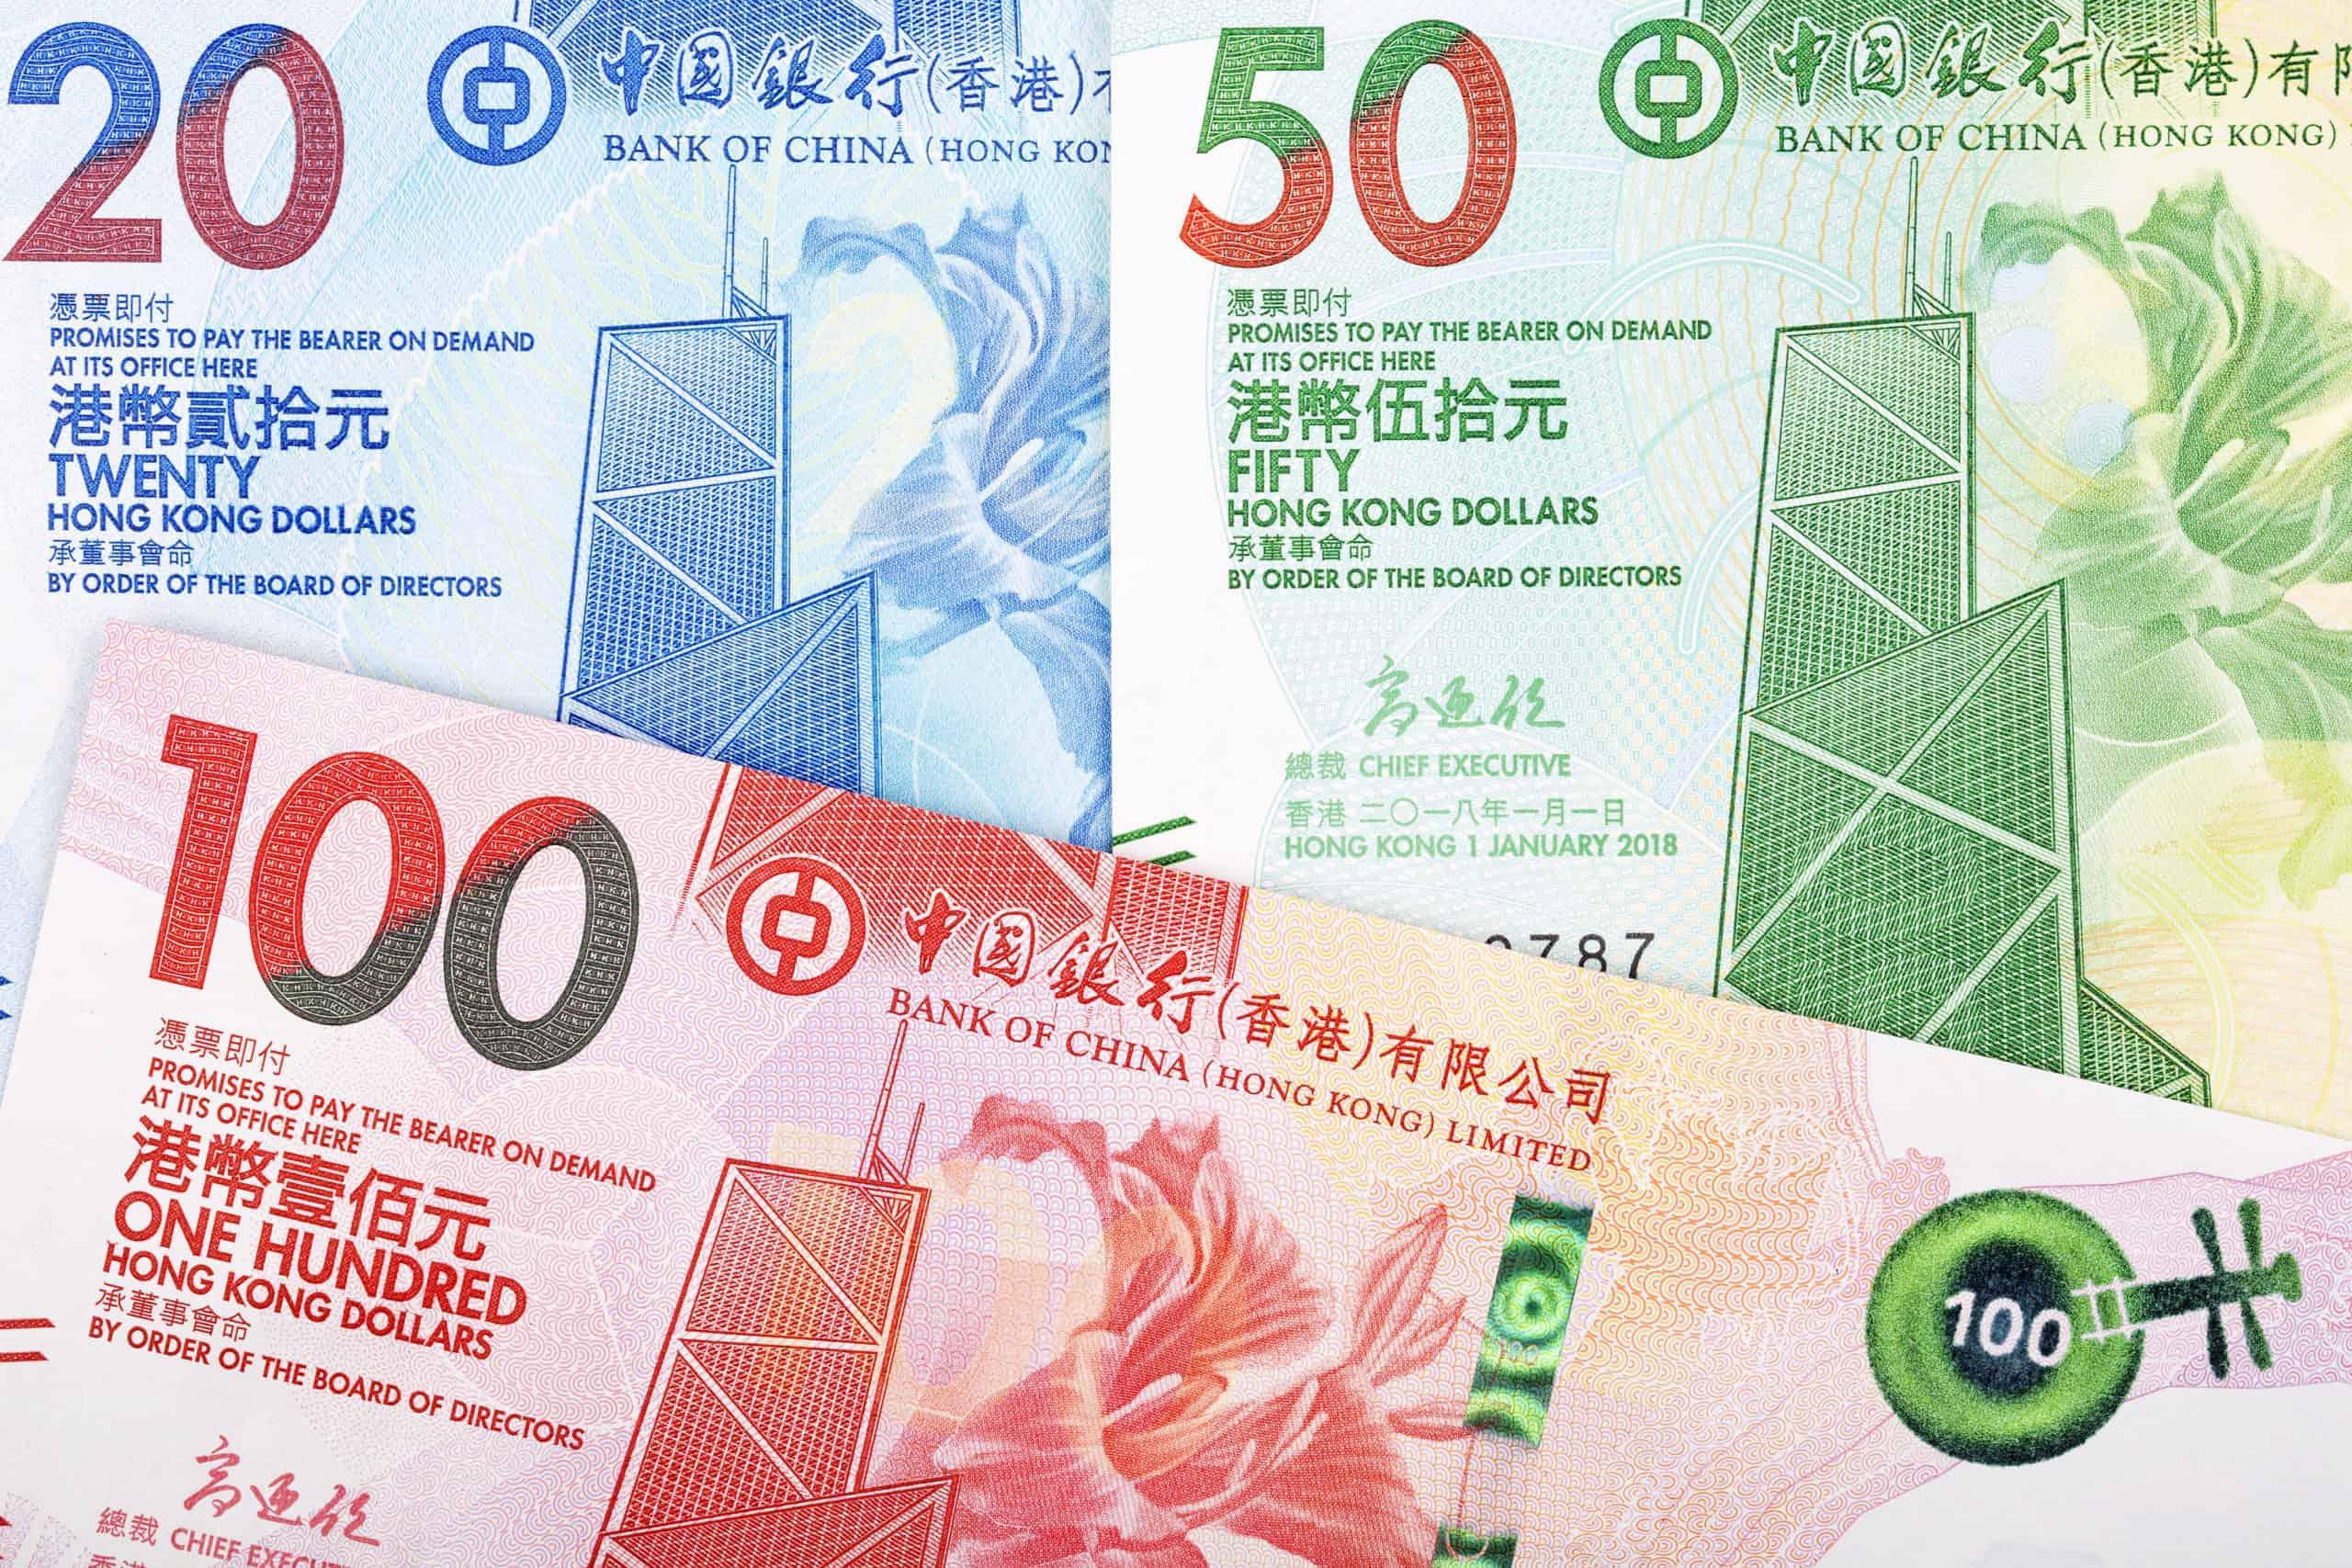 Hong Kong eyes digital currency as part of new fintech plan